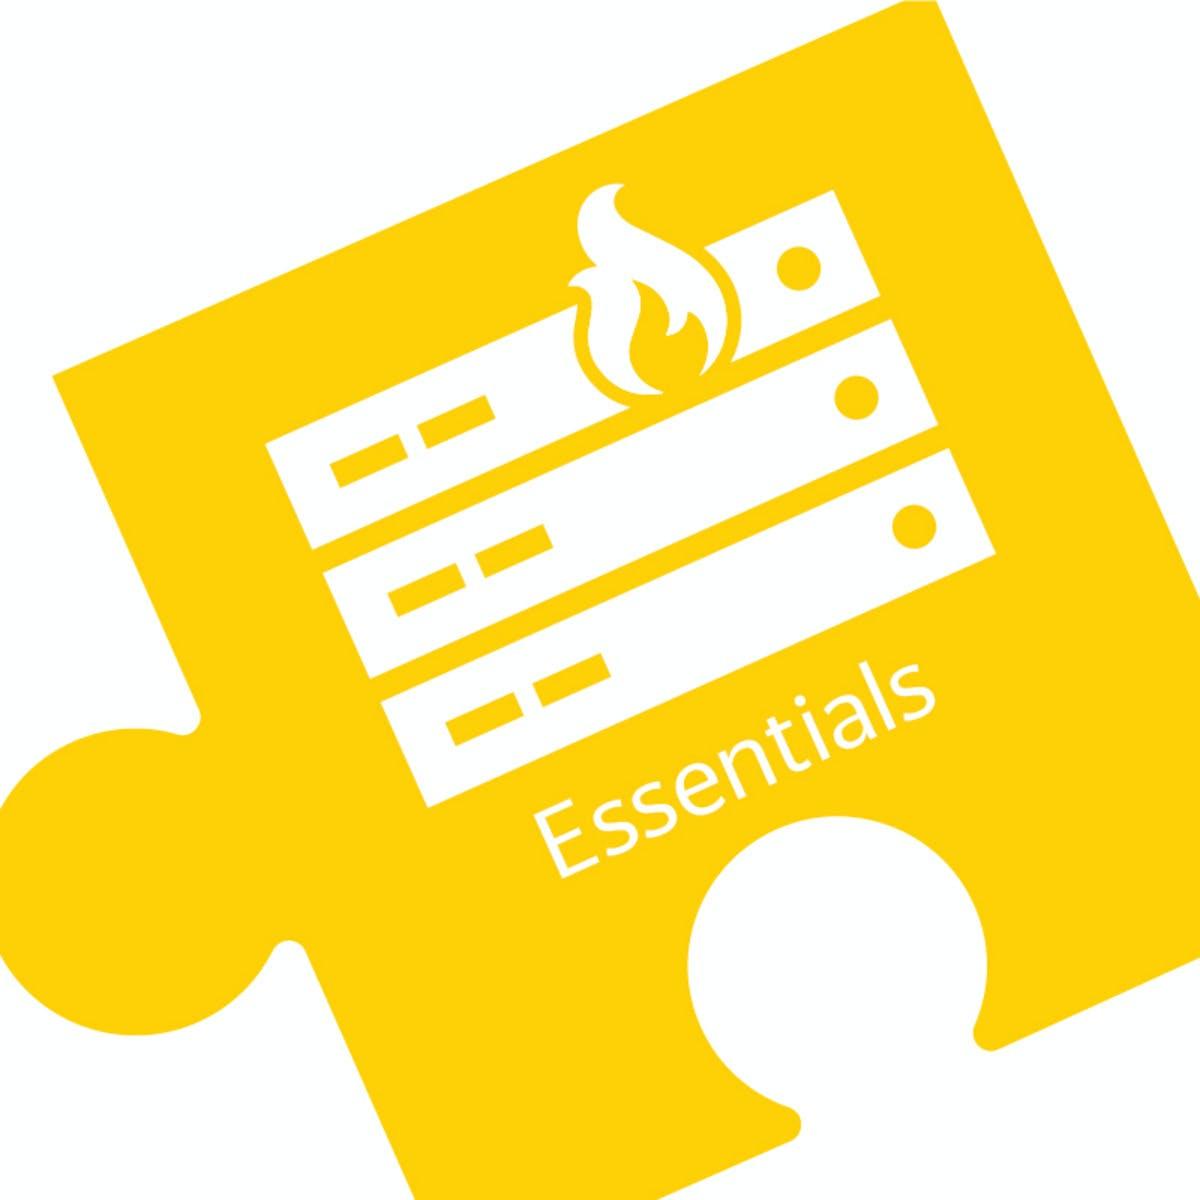 Big Data Essentials: HDFS, MapReduce and Spark RDD